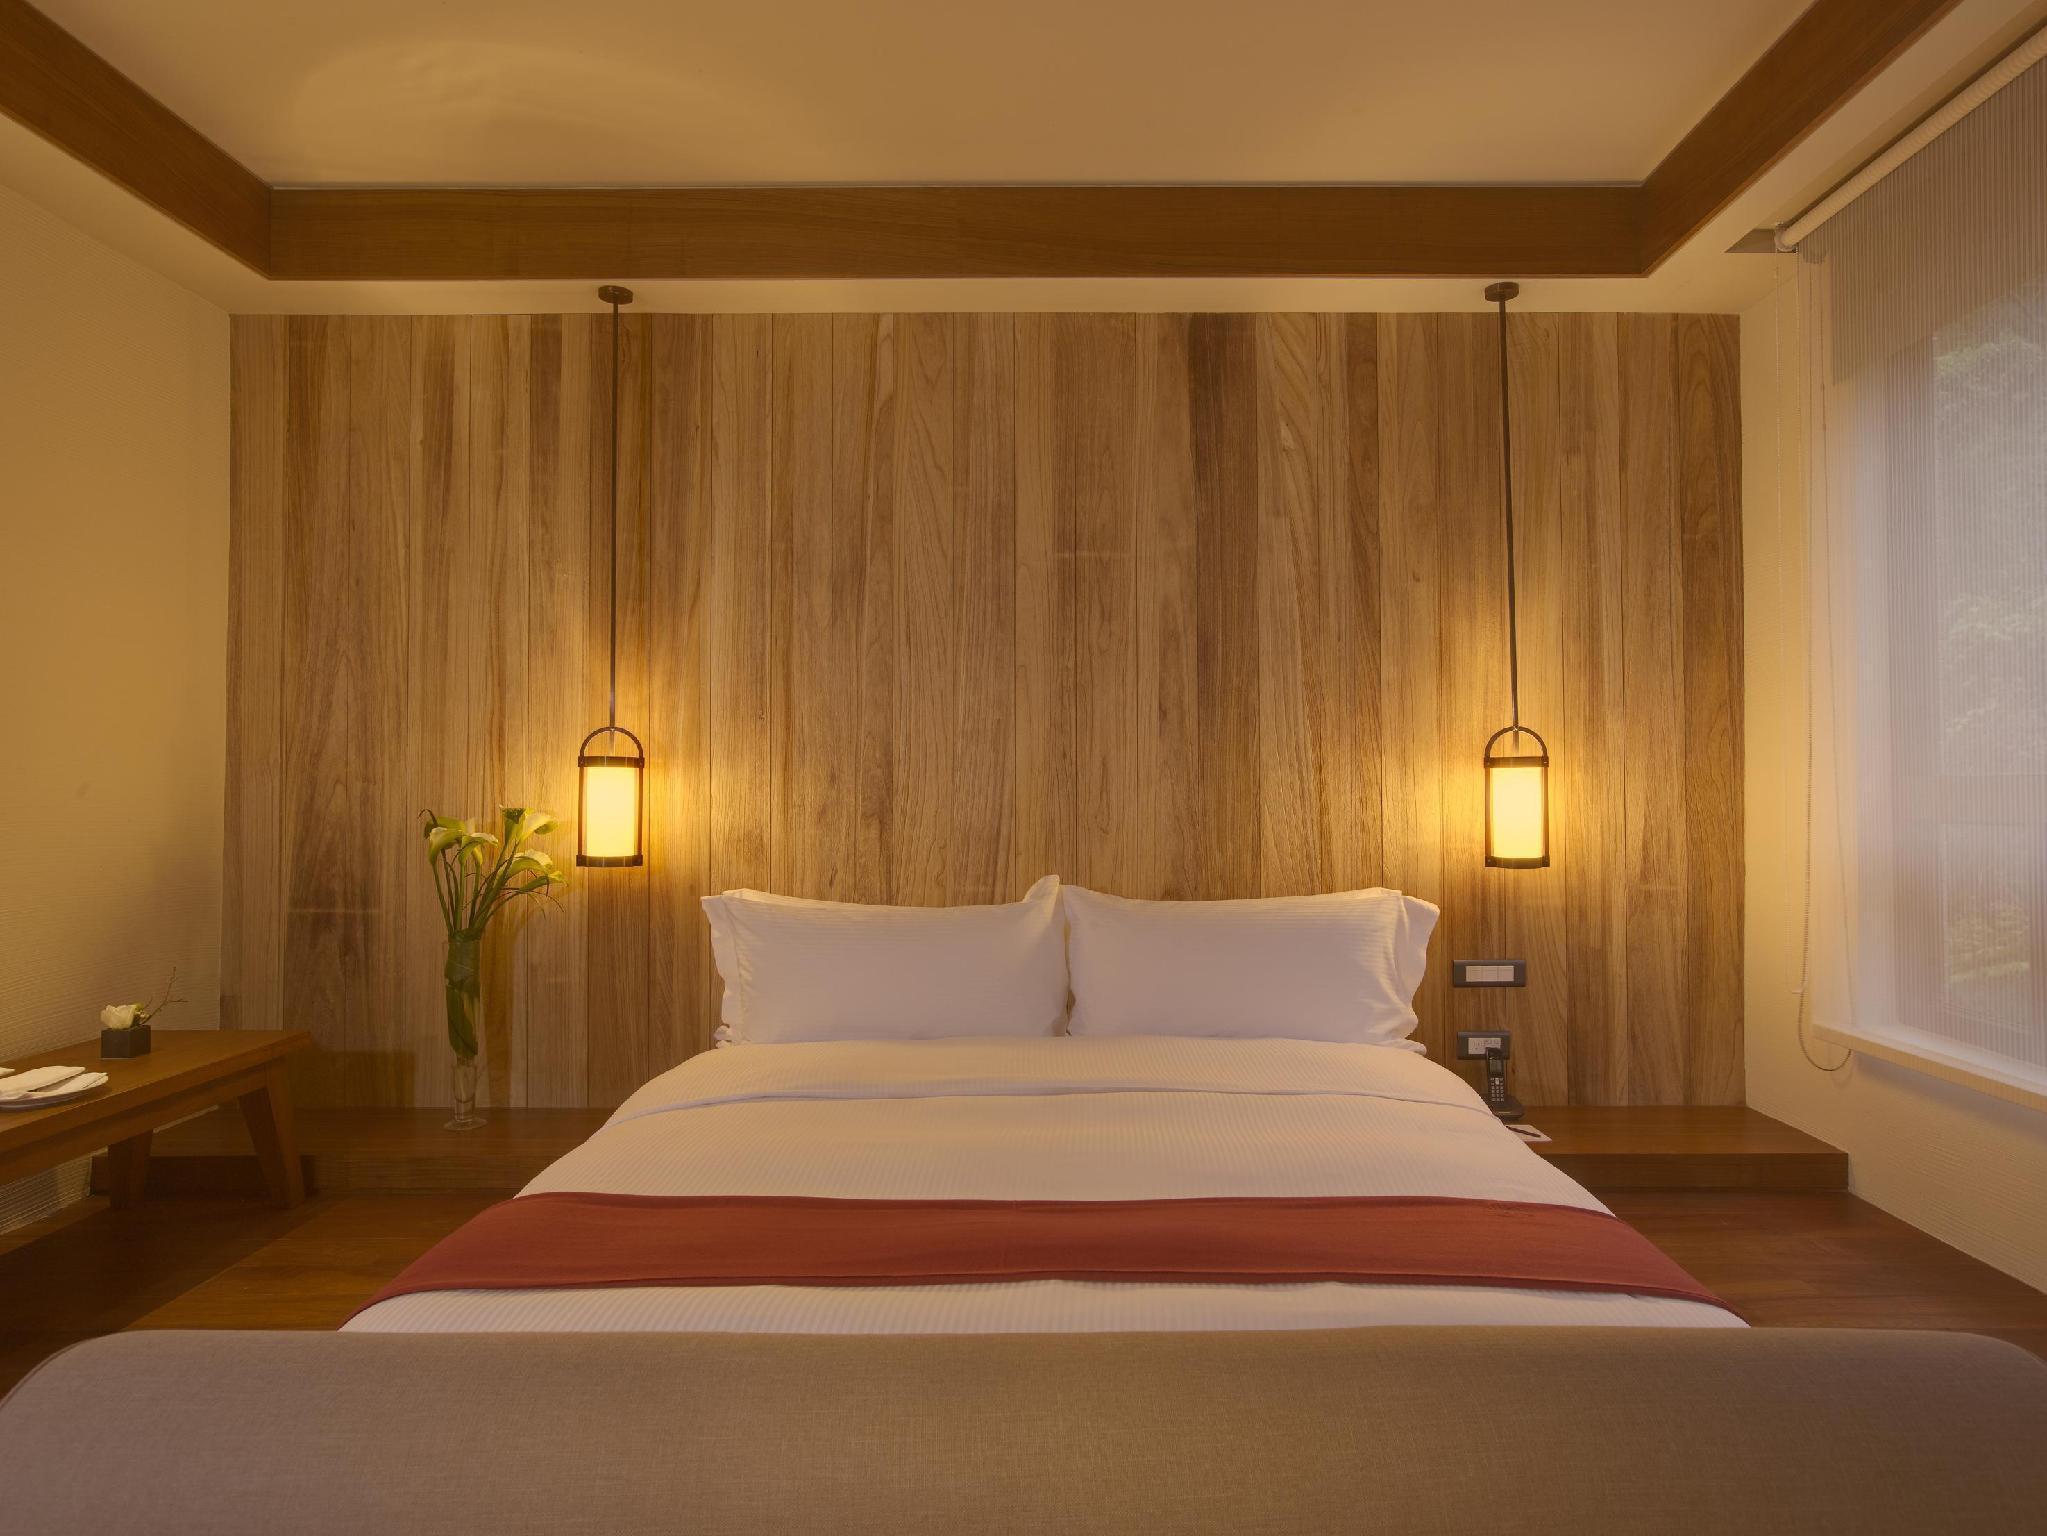 Best Price on Silks Place Taroko Hotel in Hualien + Reviews